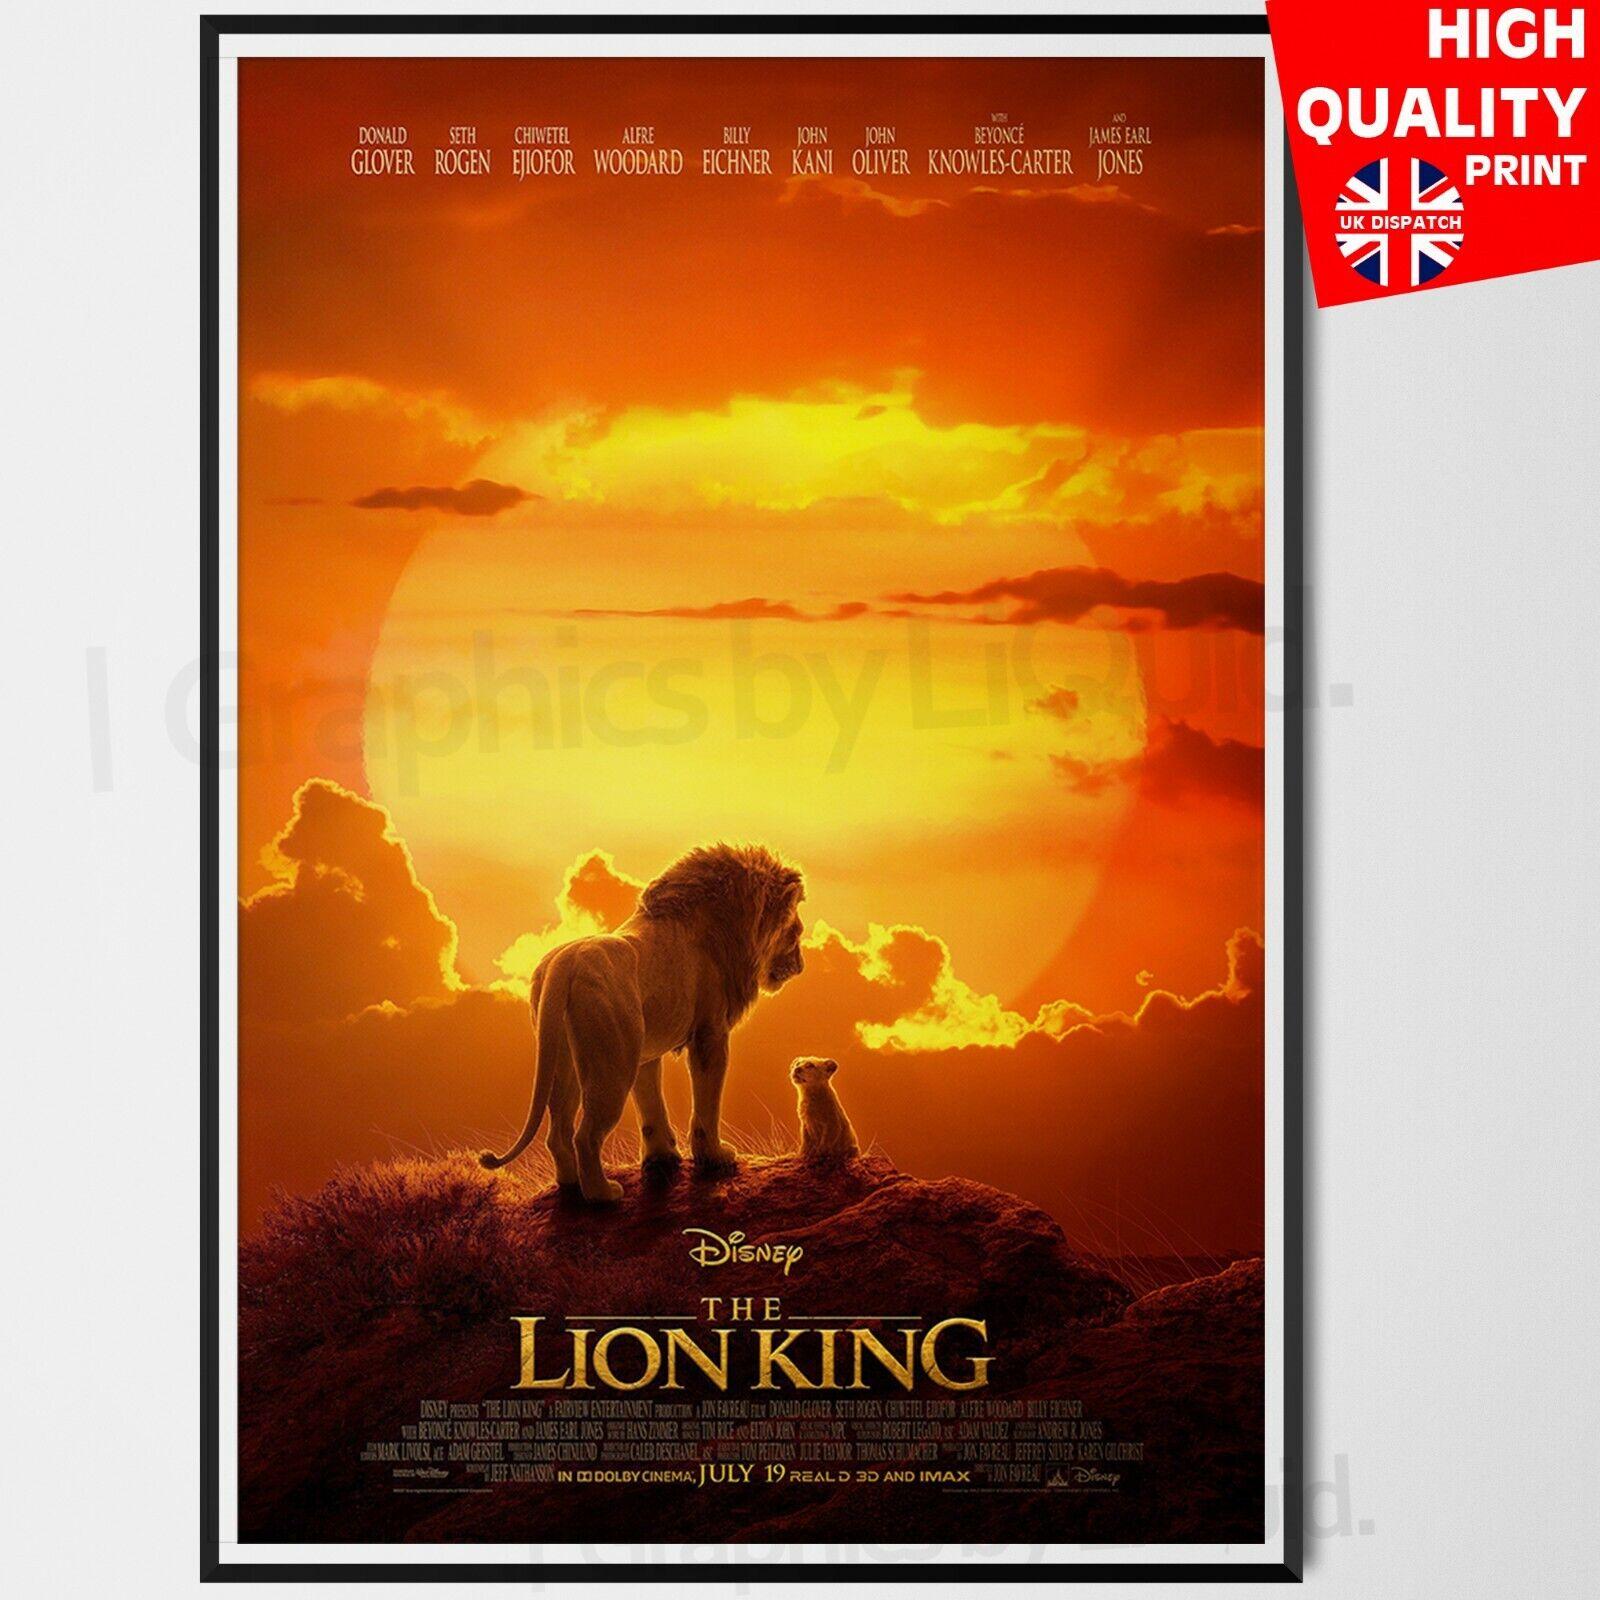 The Lion King Movie Disney 2019 Poster Art Film Print